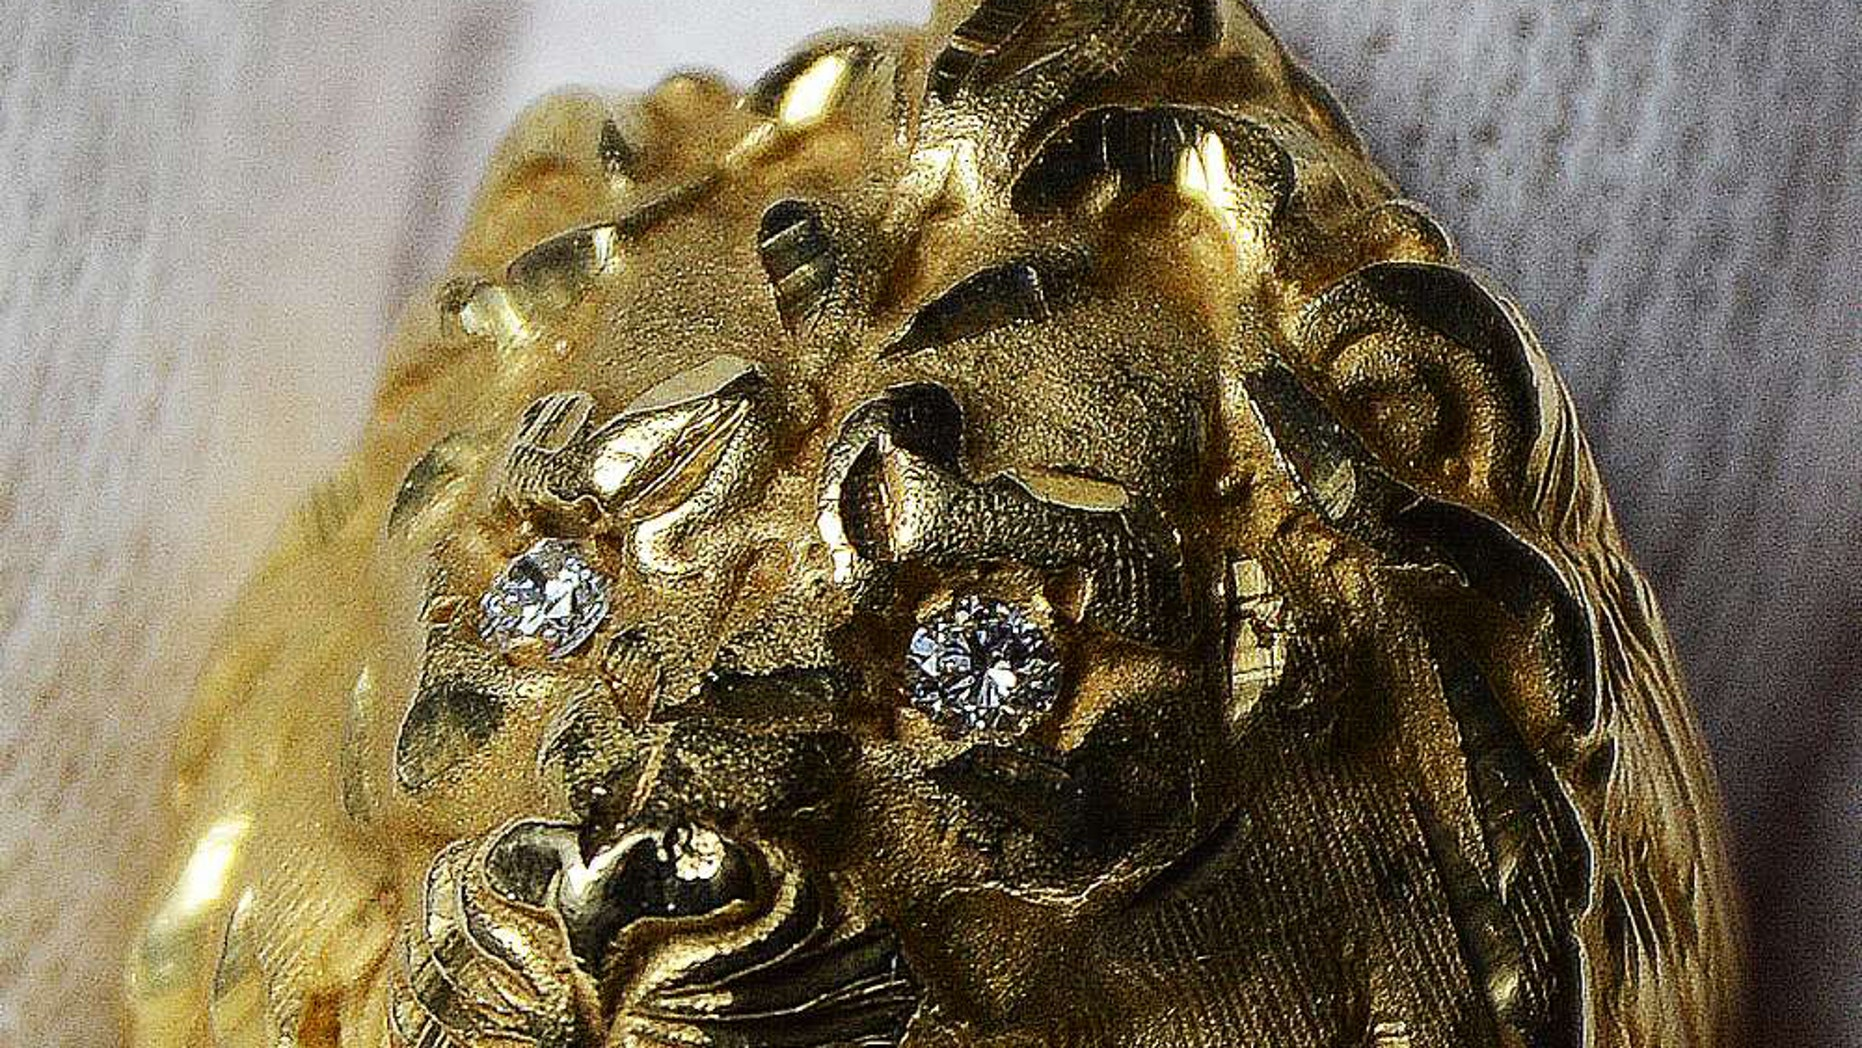 The lion head gold ring worn by Elvis Presley (Henry Aldridge & Son)